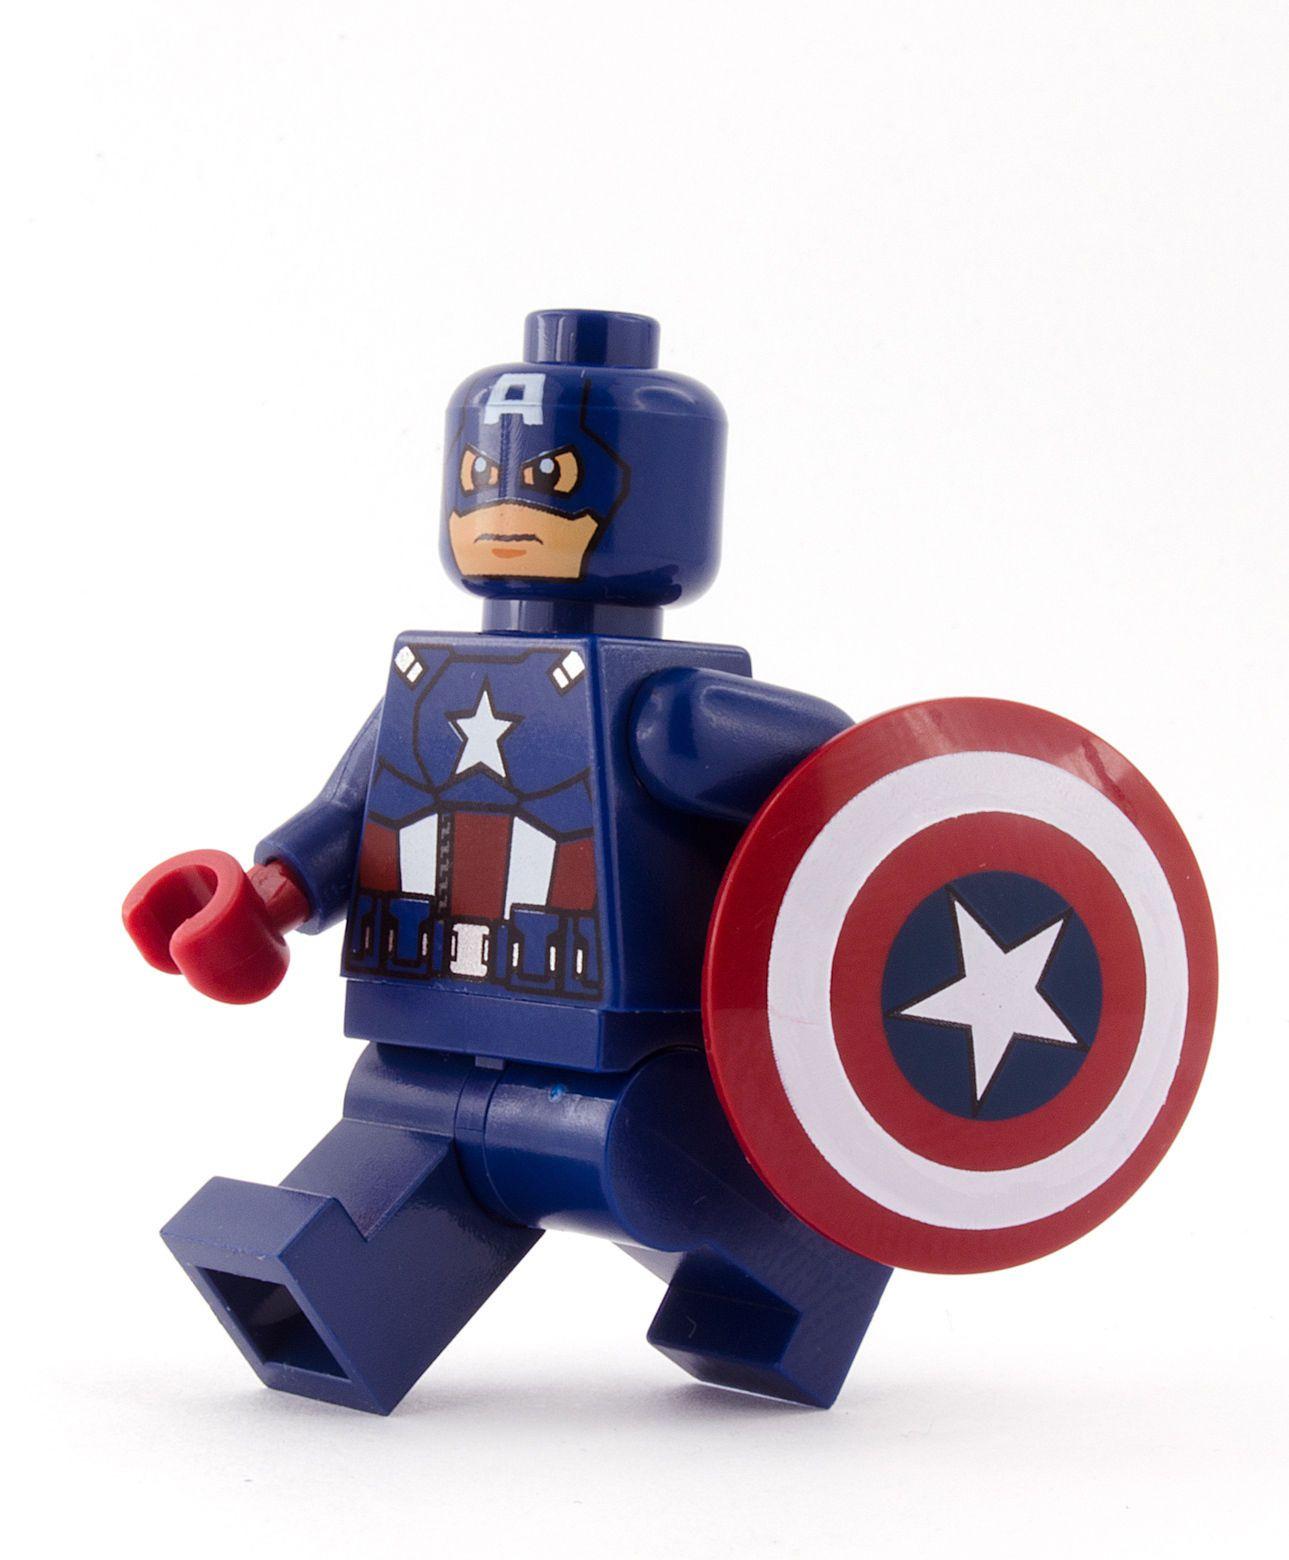 lego superheroes SUPERMAN IRONMAN SPIDERMAN VINYL WALL